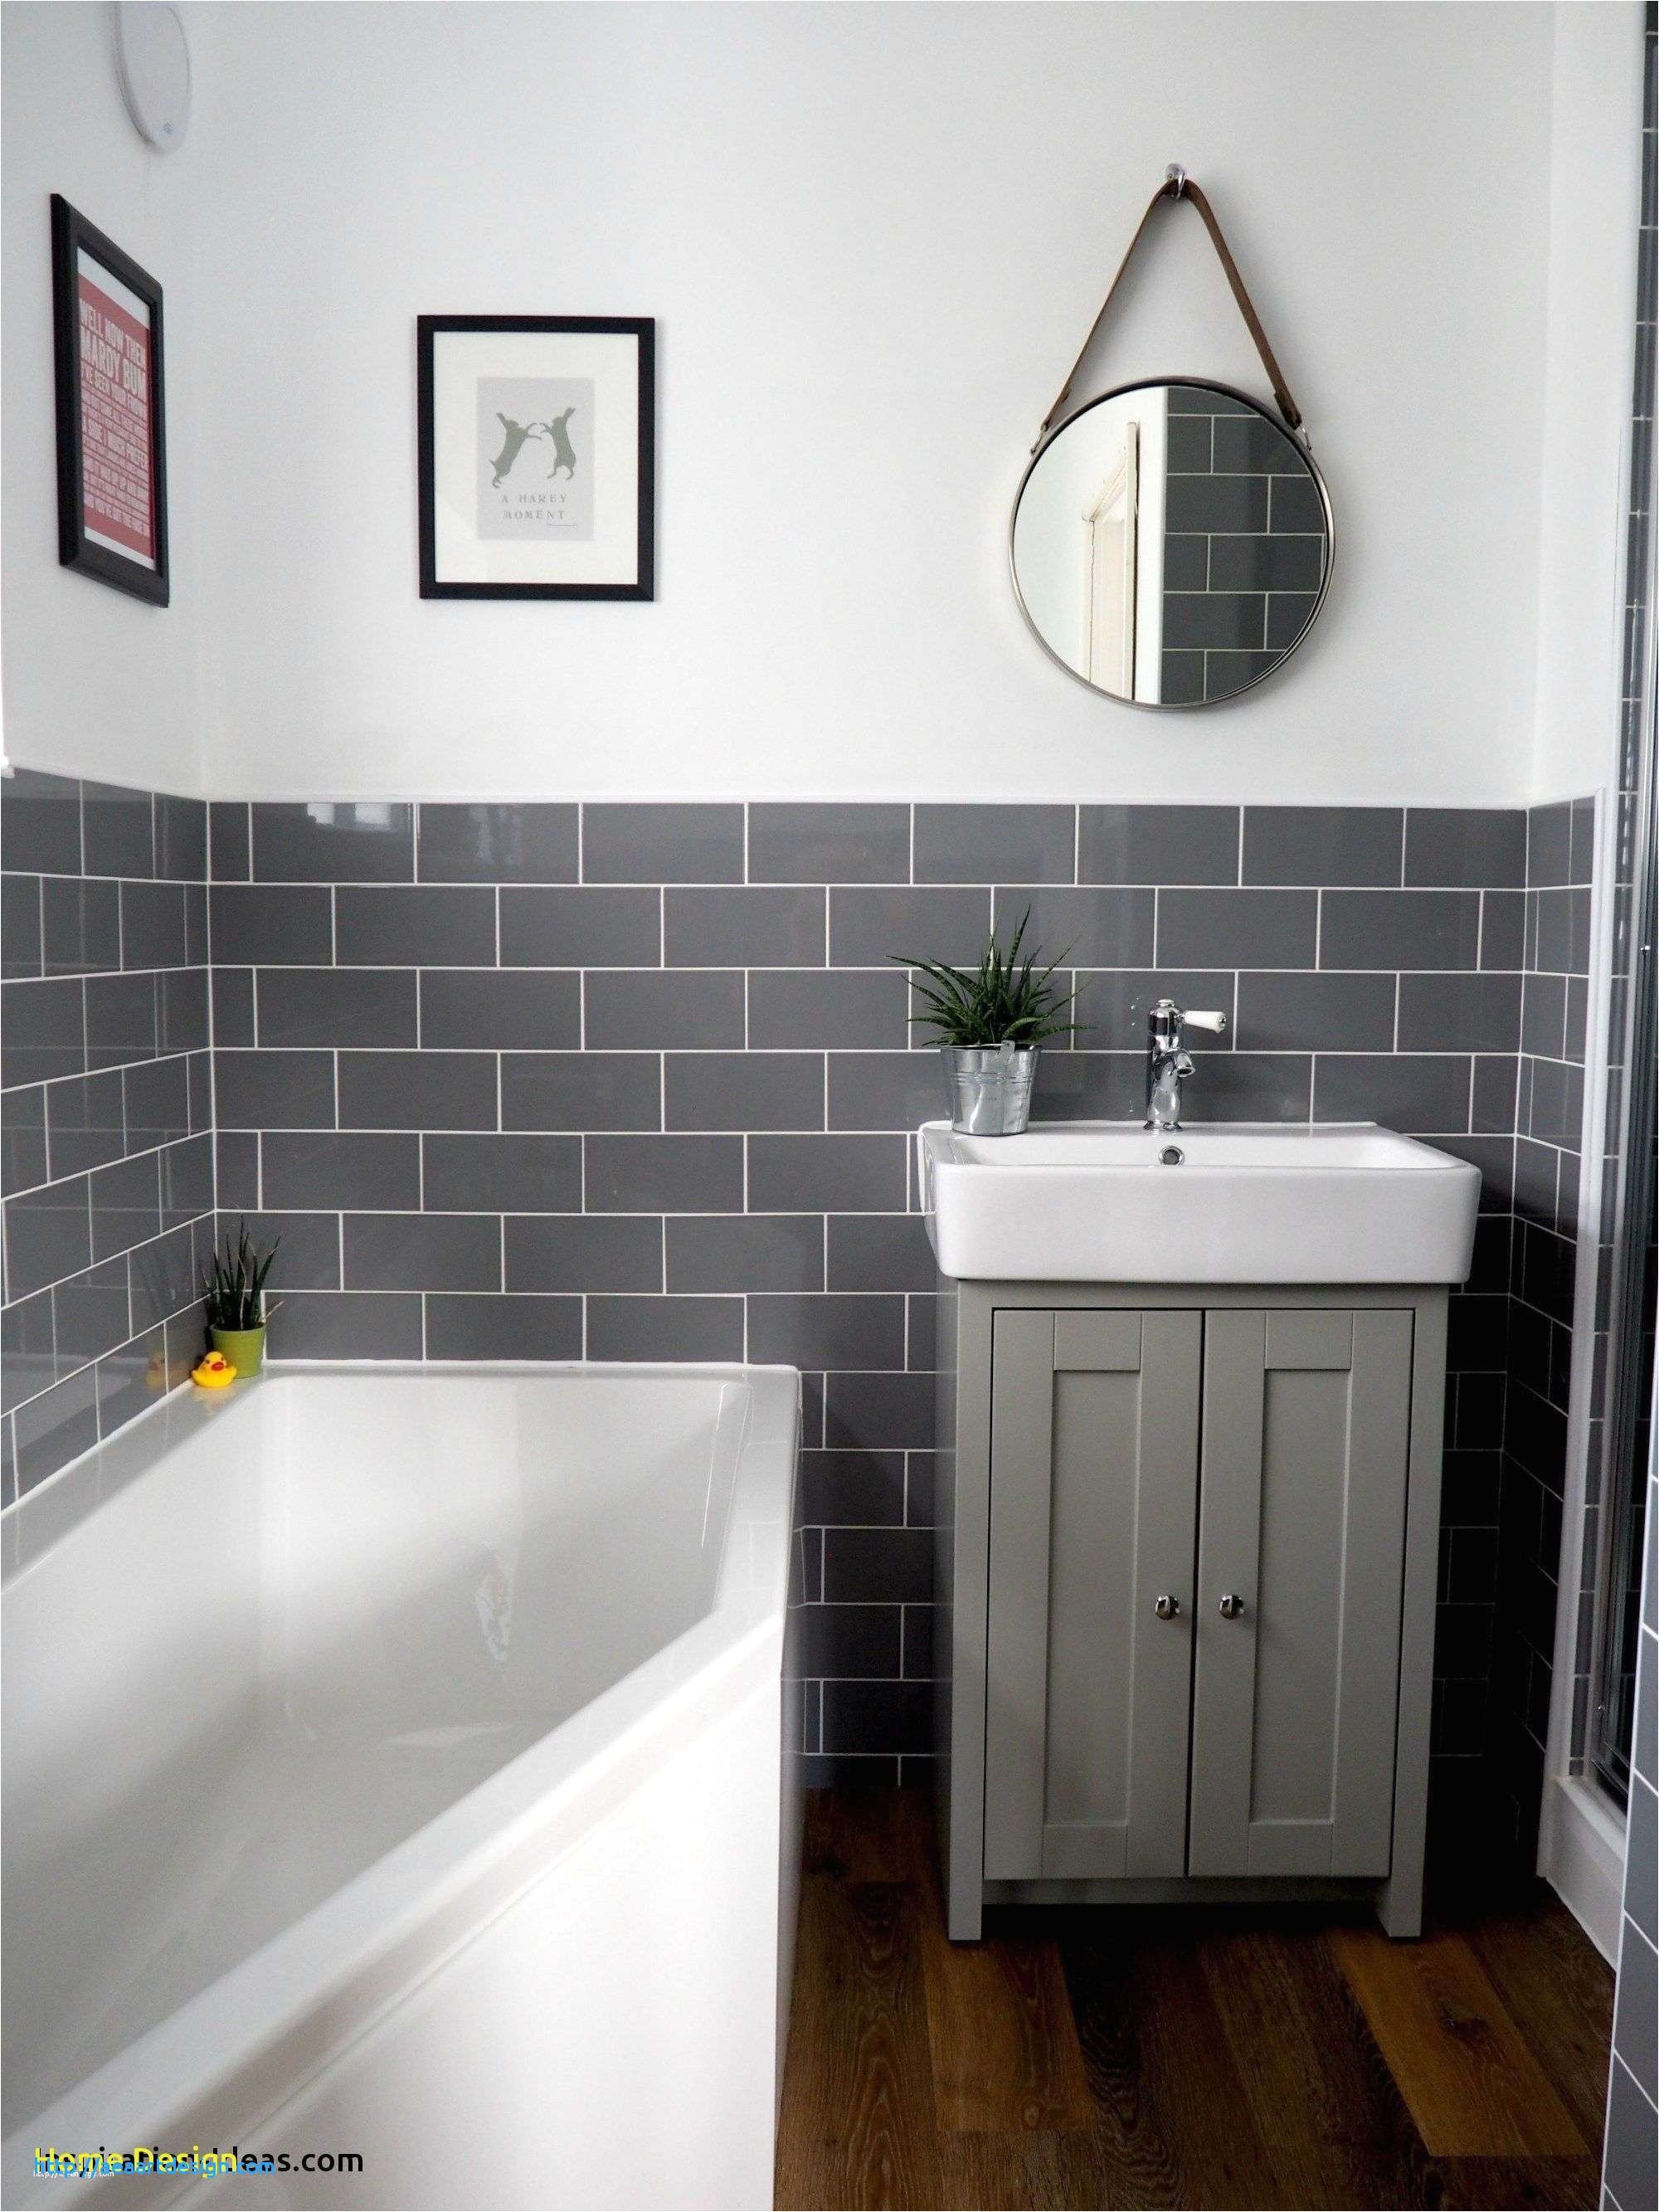 Elegance Master Bathroom Design Ideas Aeaartdesign